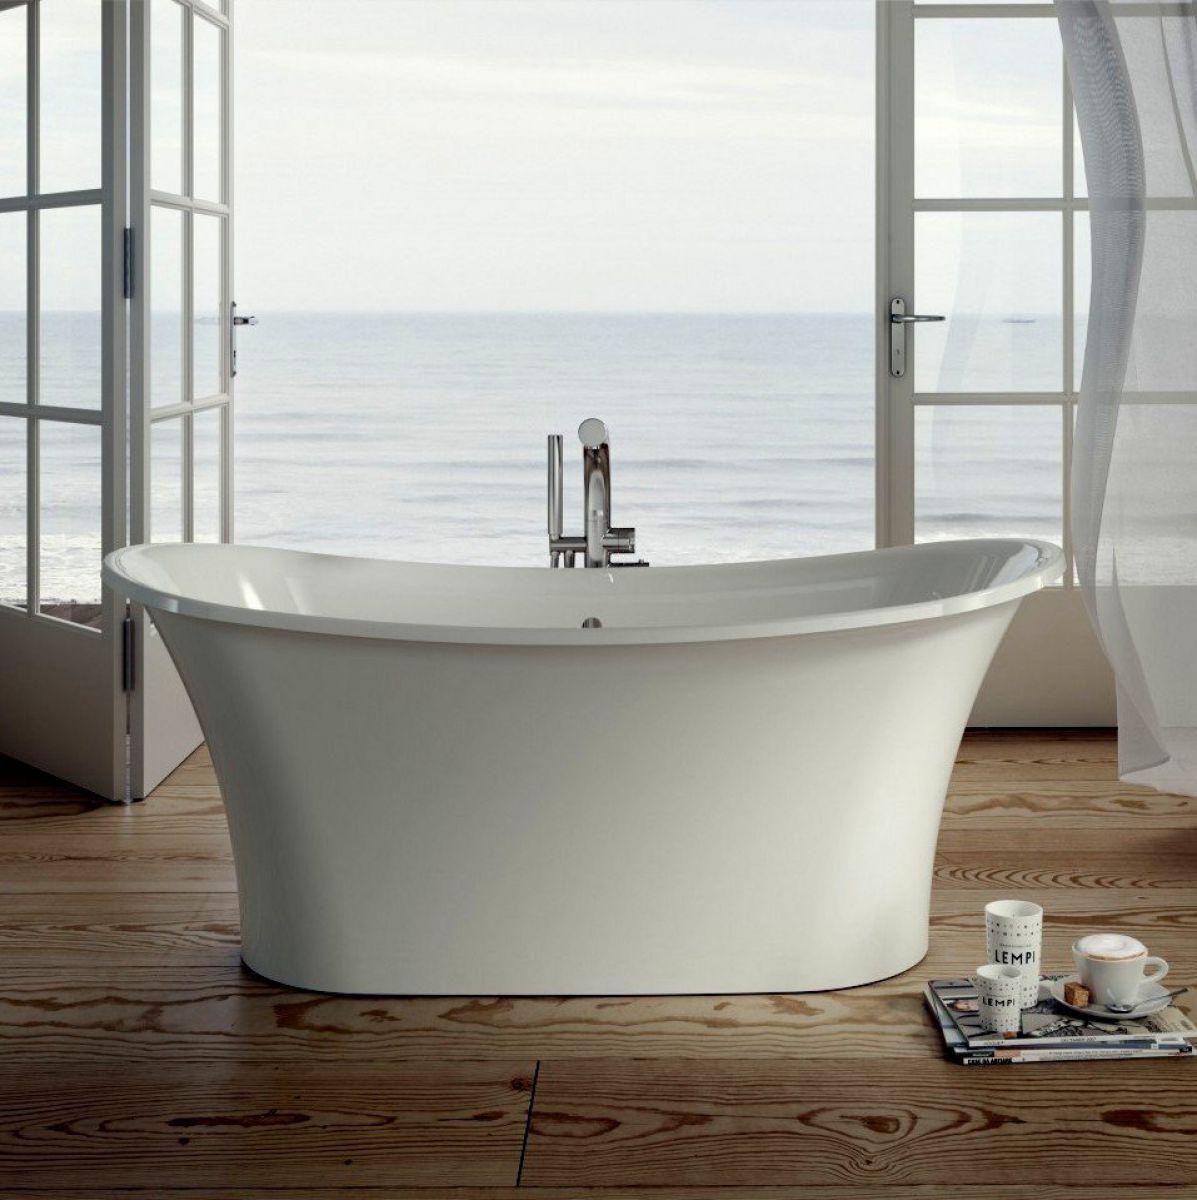 Slipper Bath Uk Ramsden mosley jura double ended freestanding bath uk bathrooms ramsden mosley jura double ended freestanding bath sisterspd